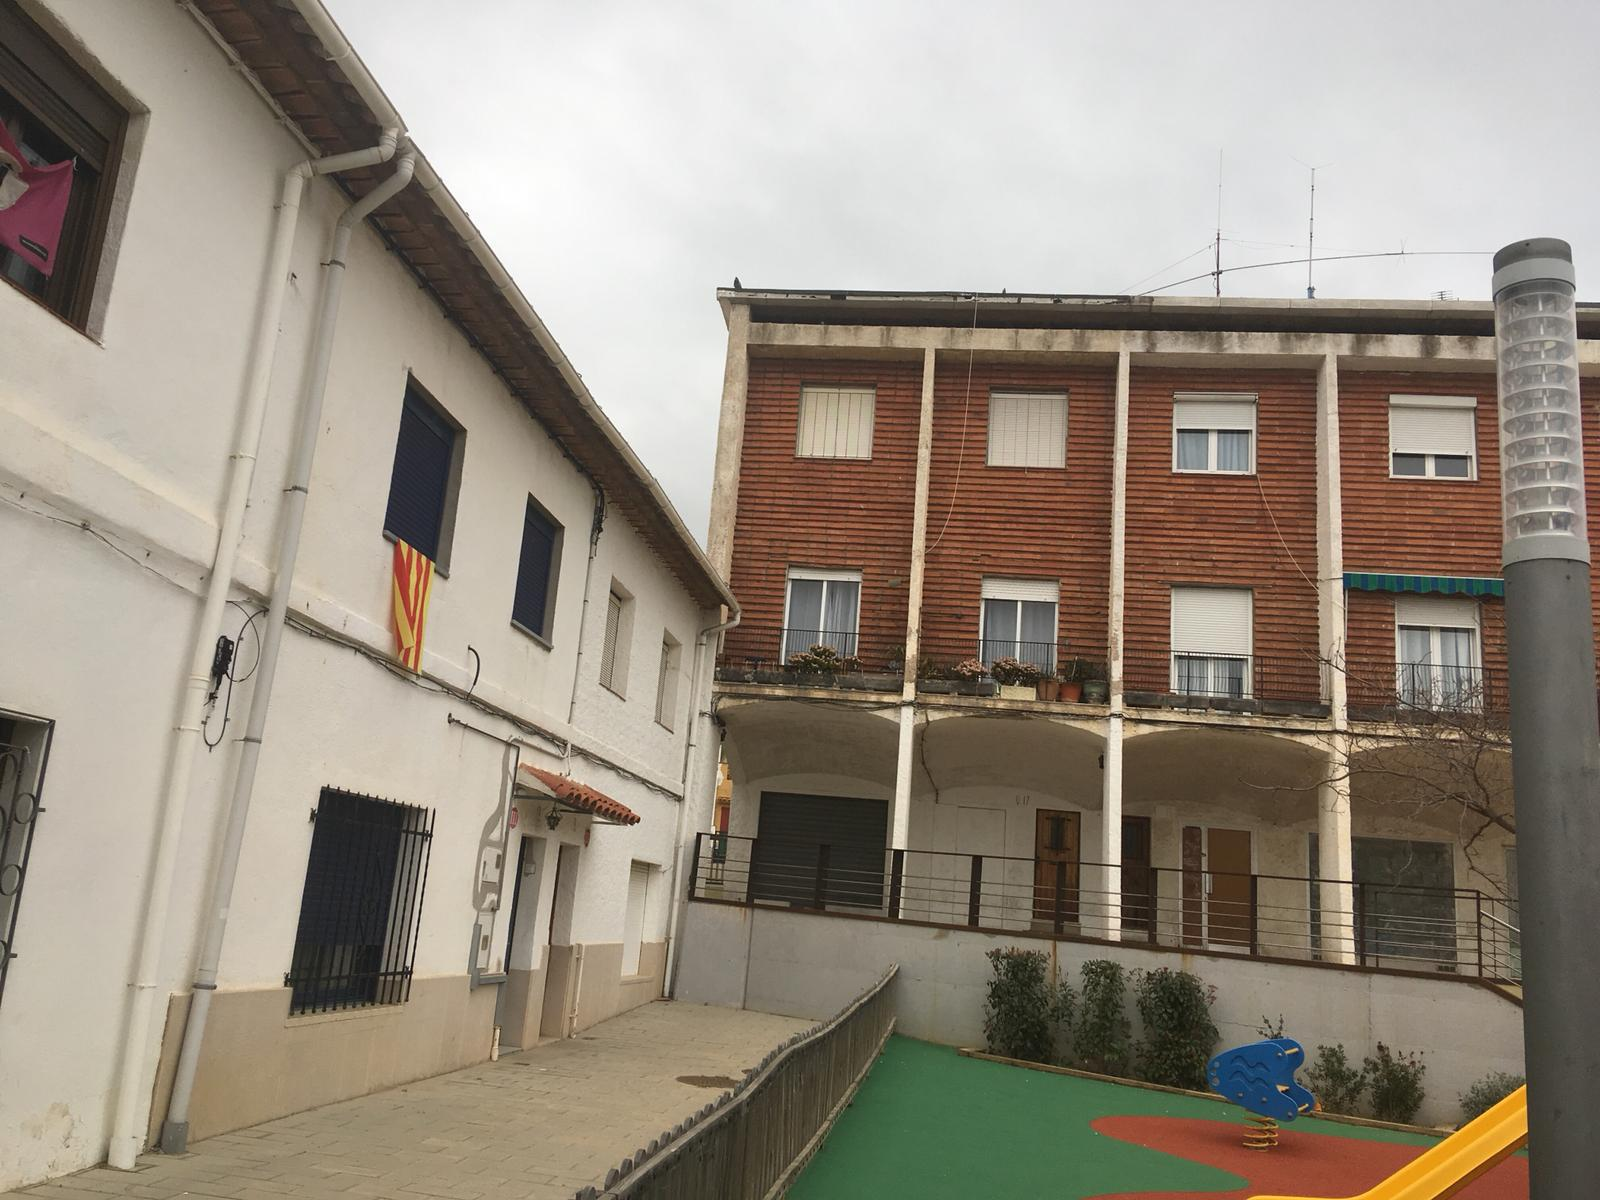 Imagen 1 Casa Adosada en venta en Palamós / Casa de 4 habitacions al costat de Hospital de Palamos